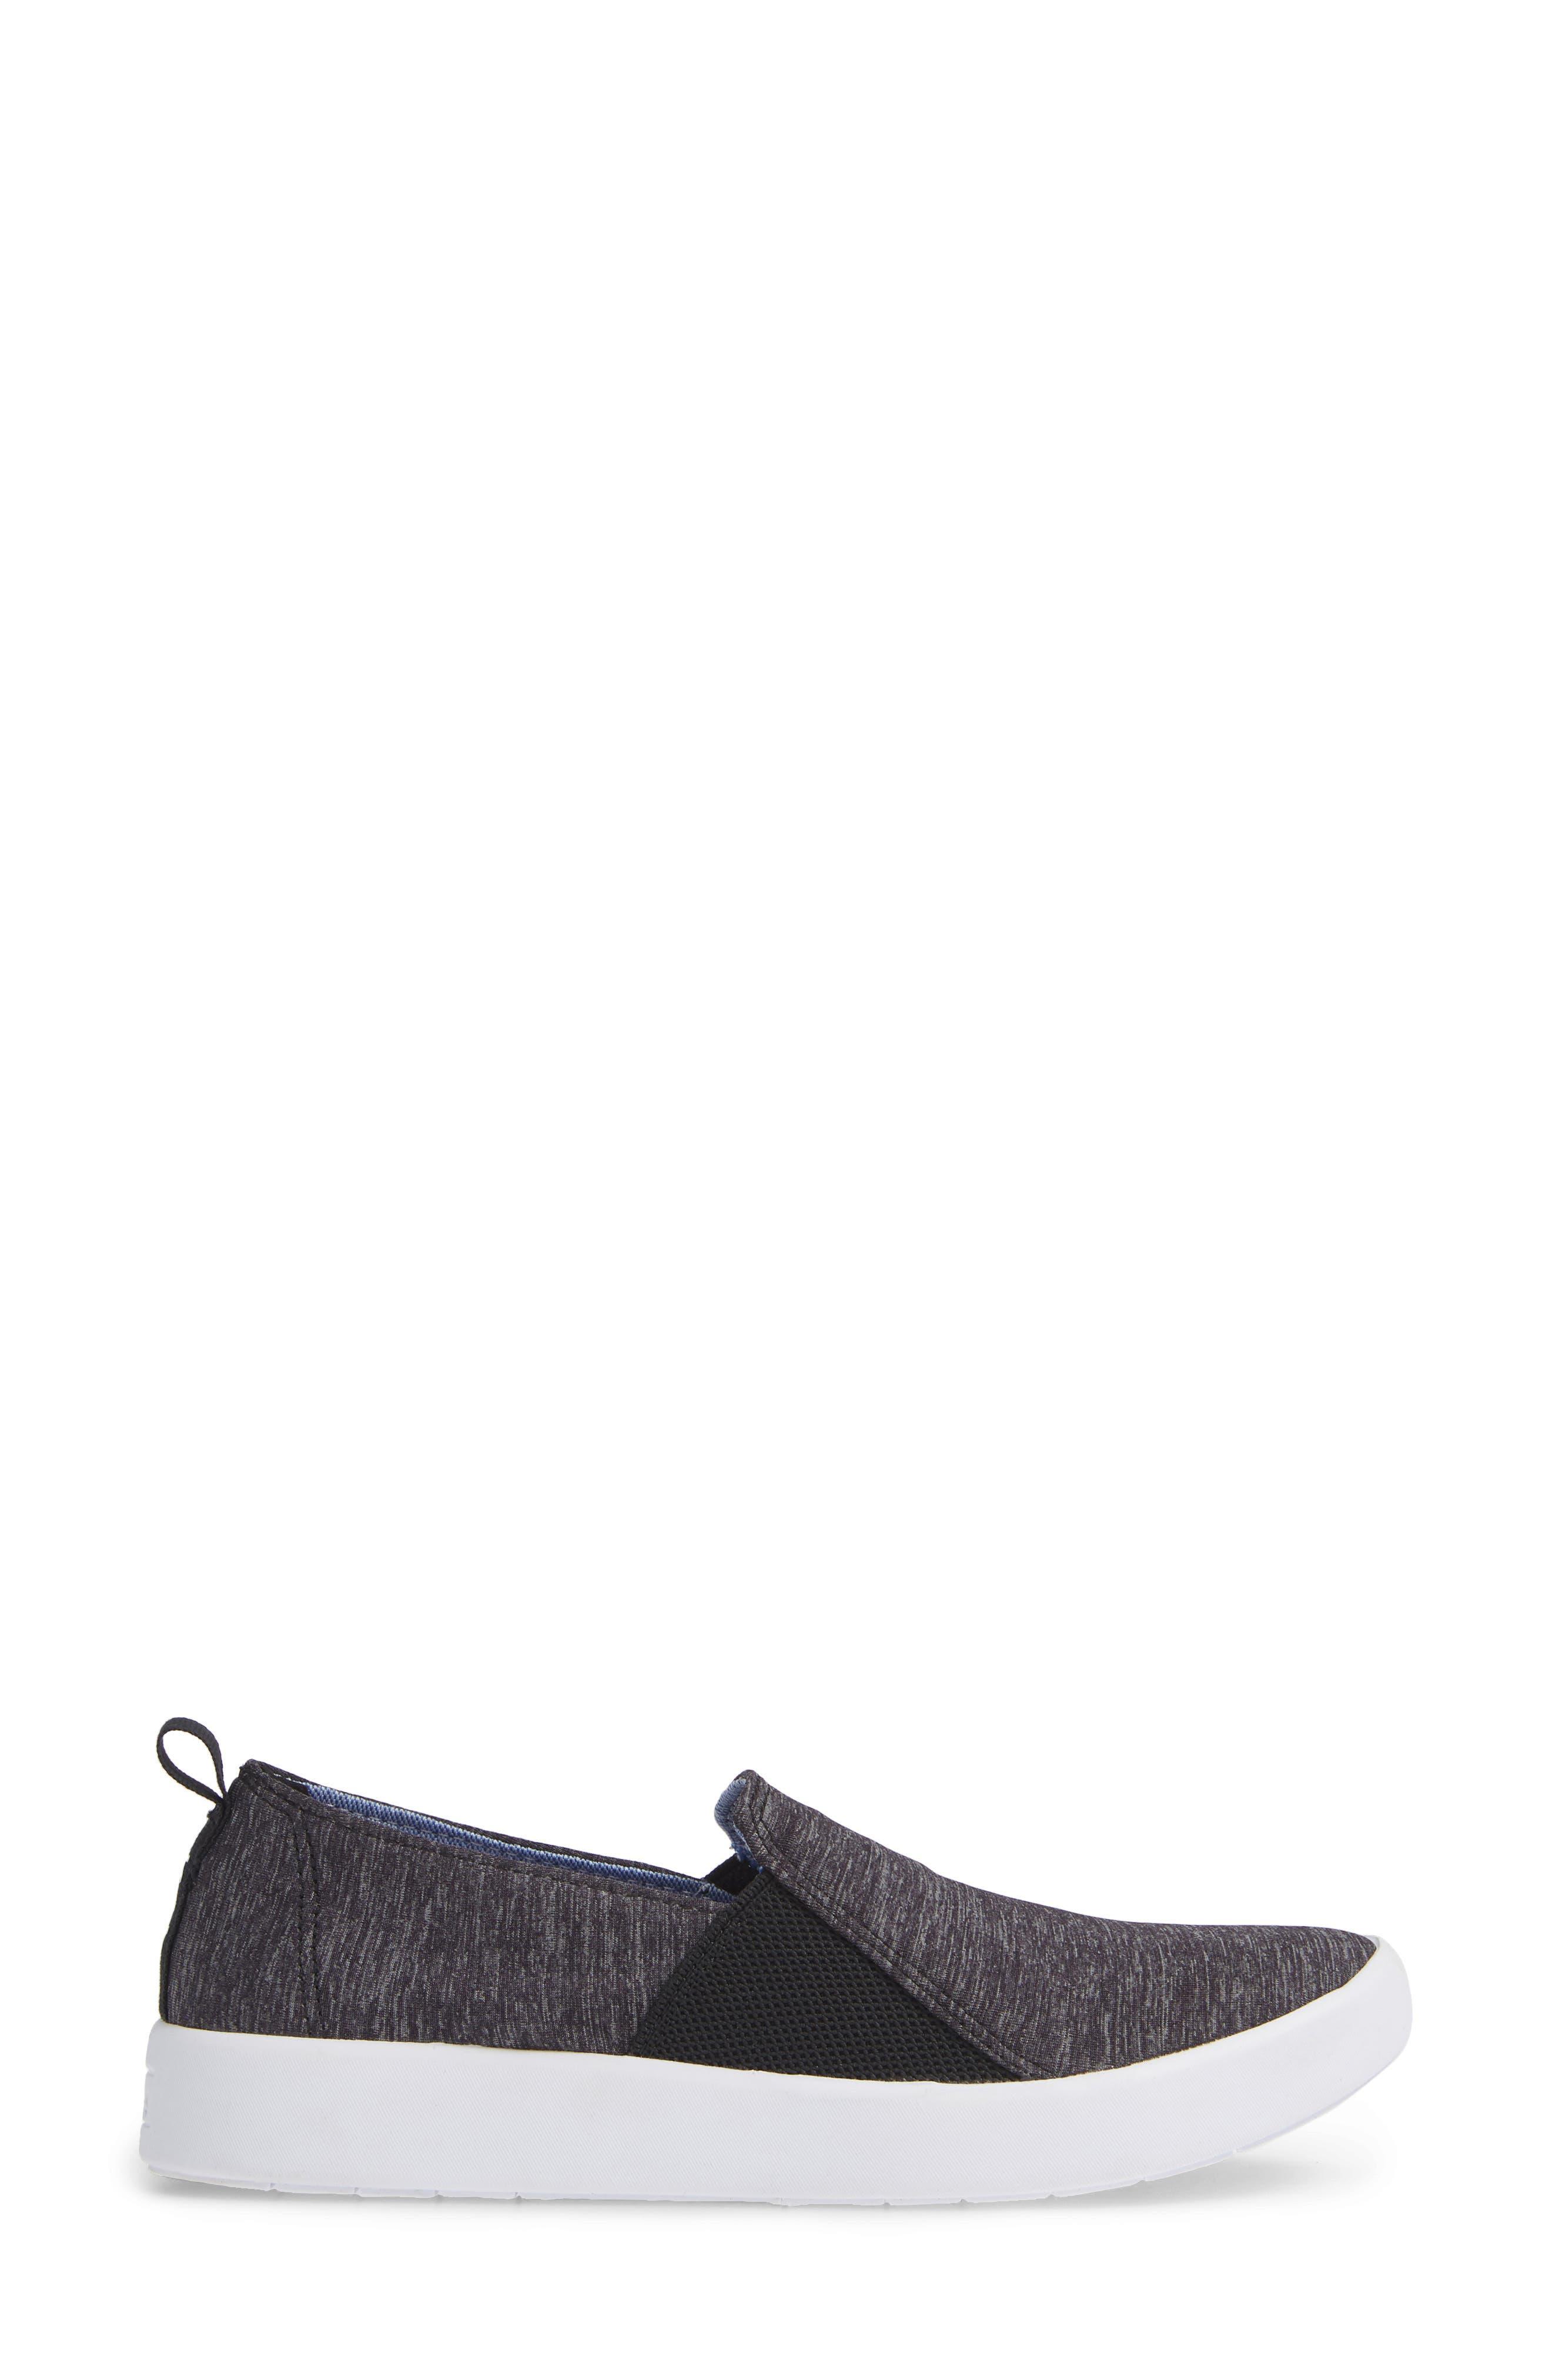 KEDS<SUP>®</SUP>, Studio Liv Active Knit Sneaker, Alternate thumbnail 3, color, BLACK